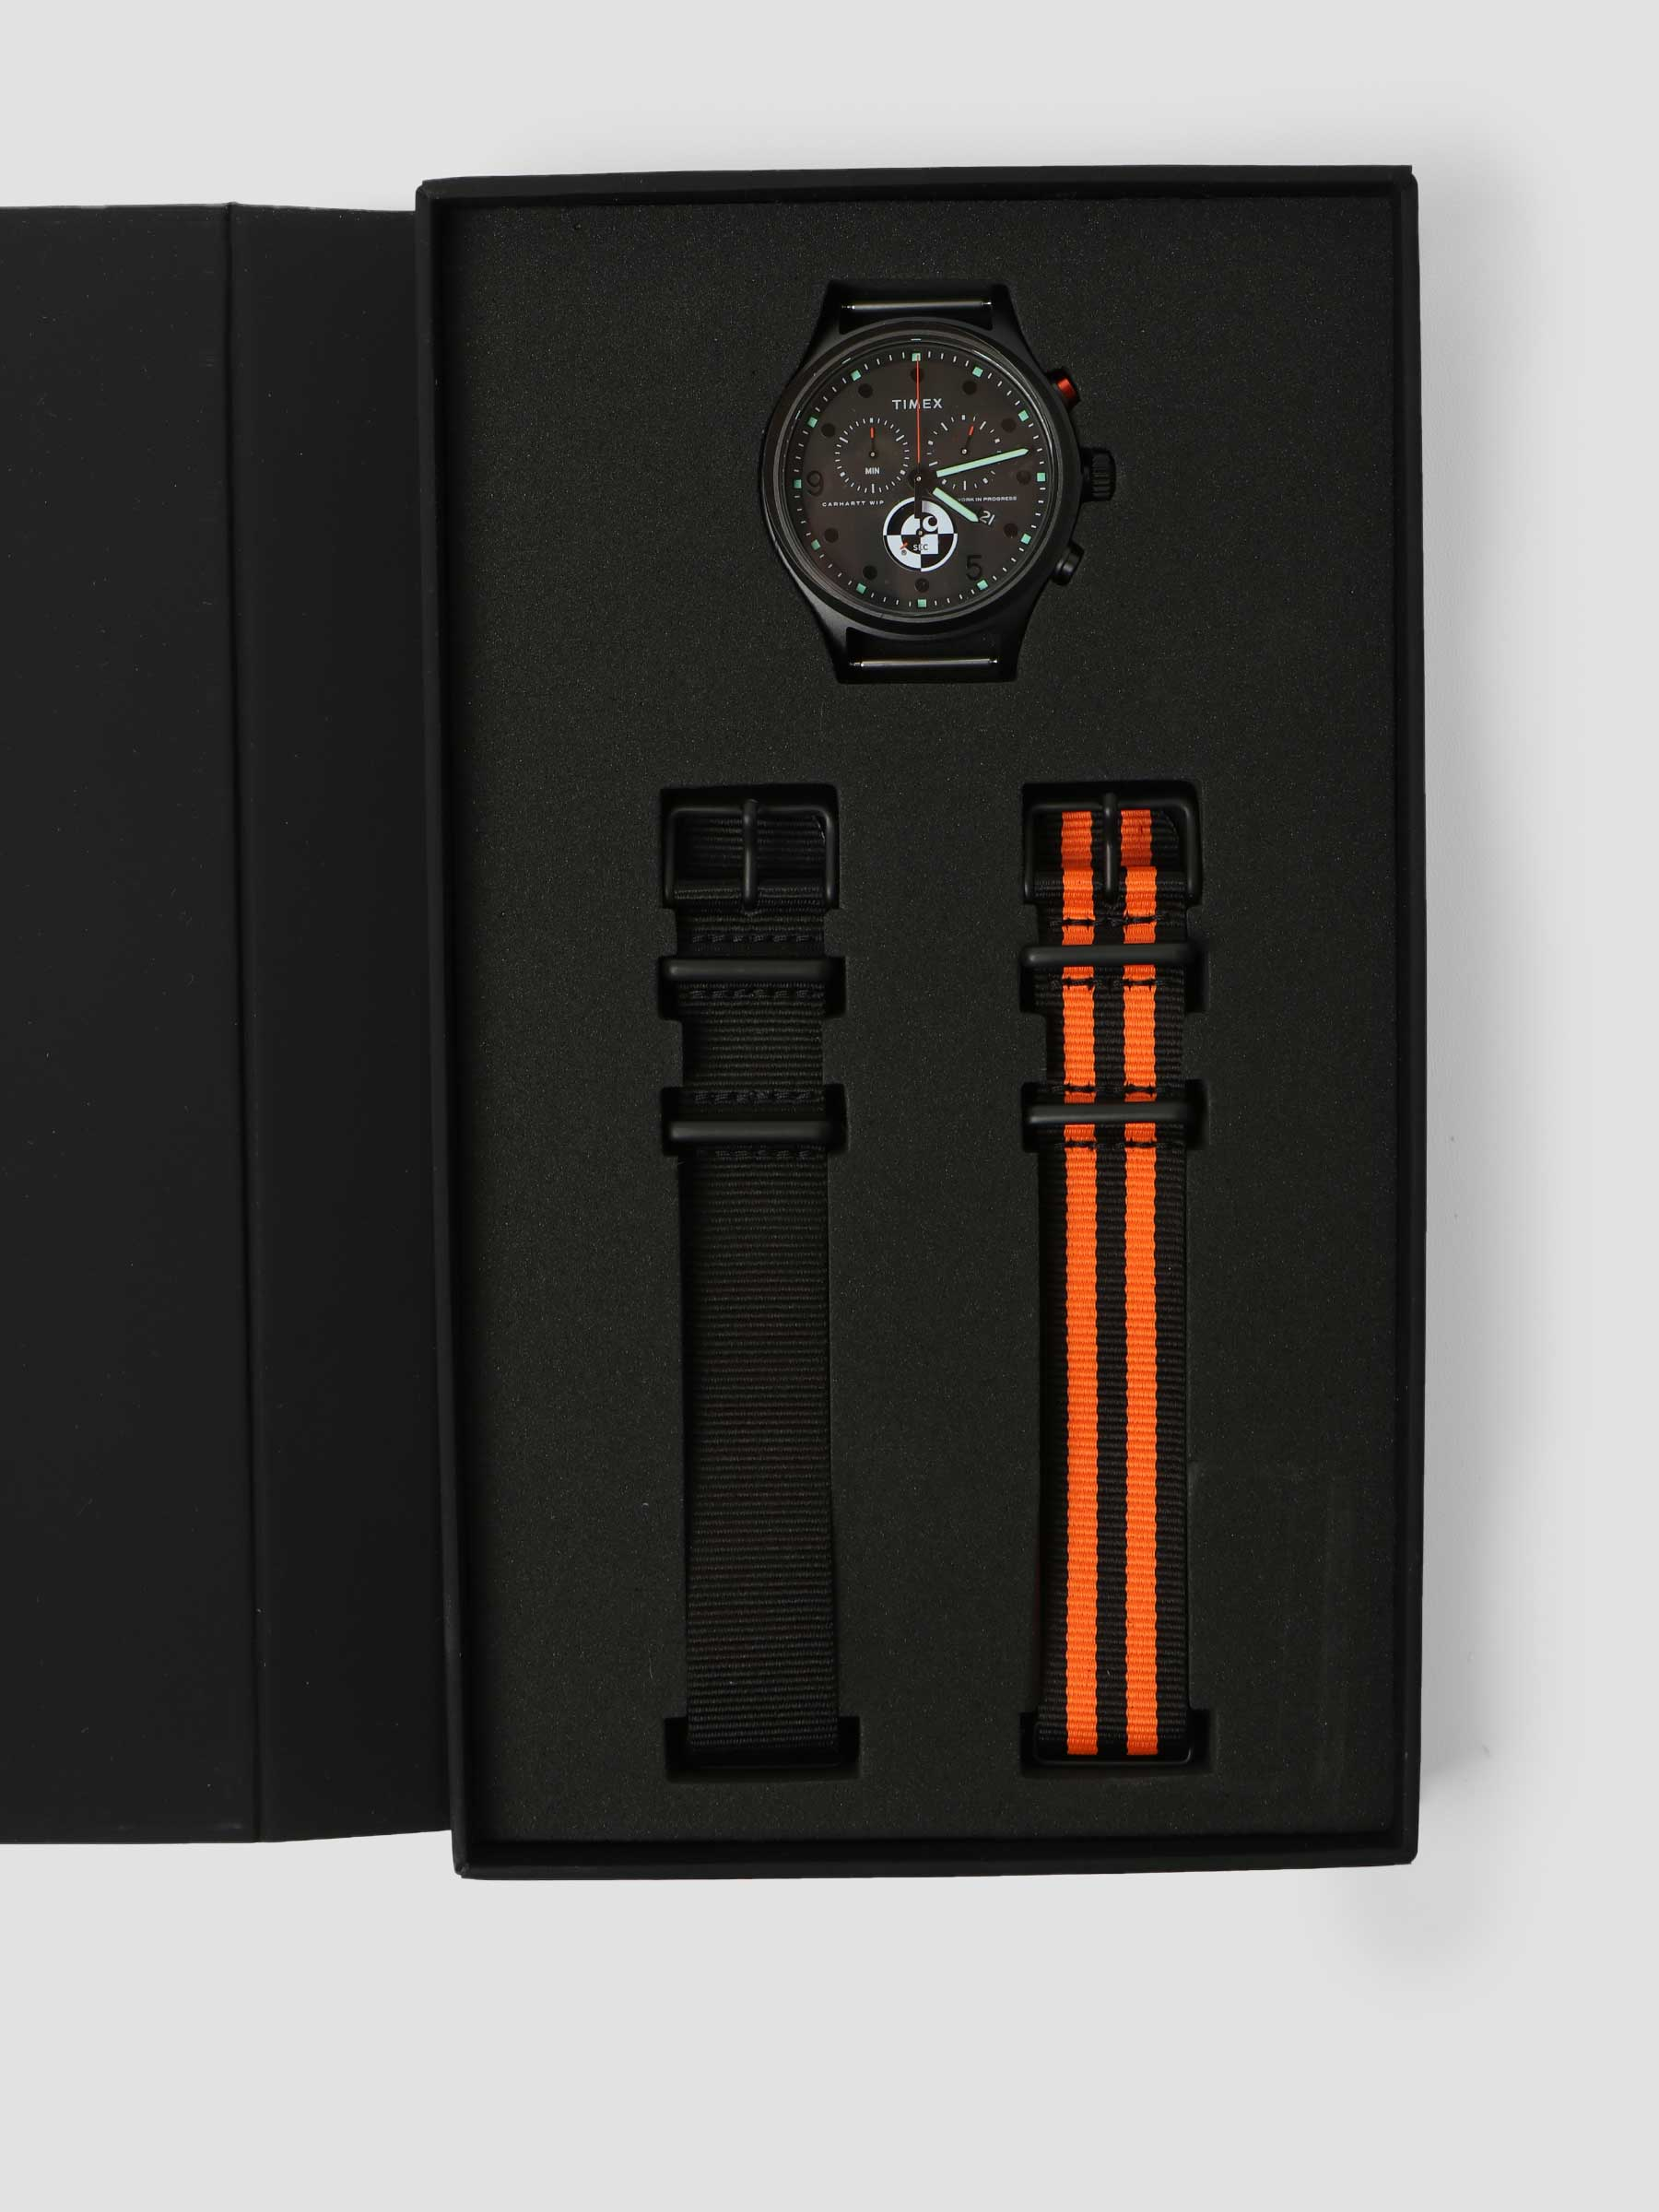 Range C Allied Chronograph Black Carhartt Orange Glow in the Dark I029862